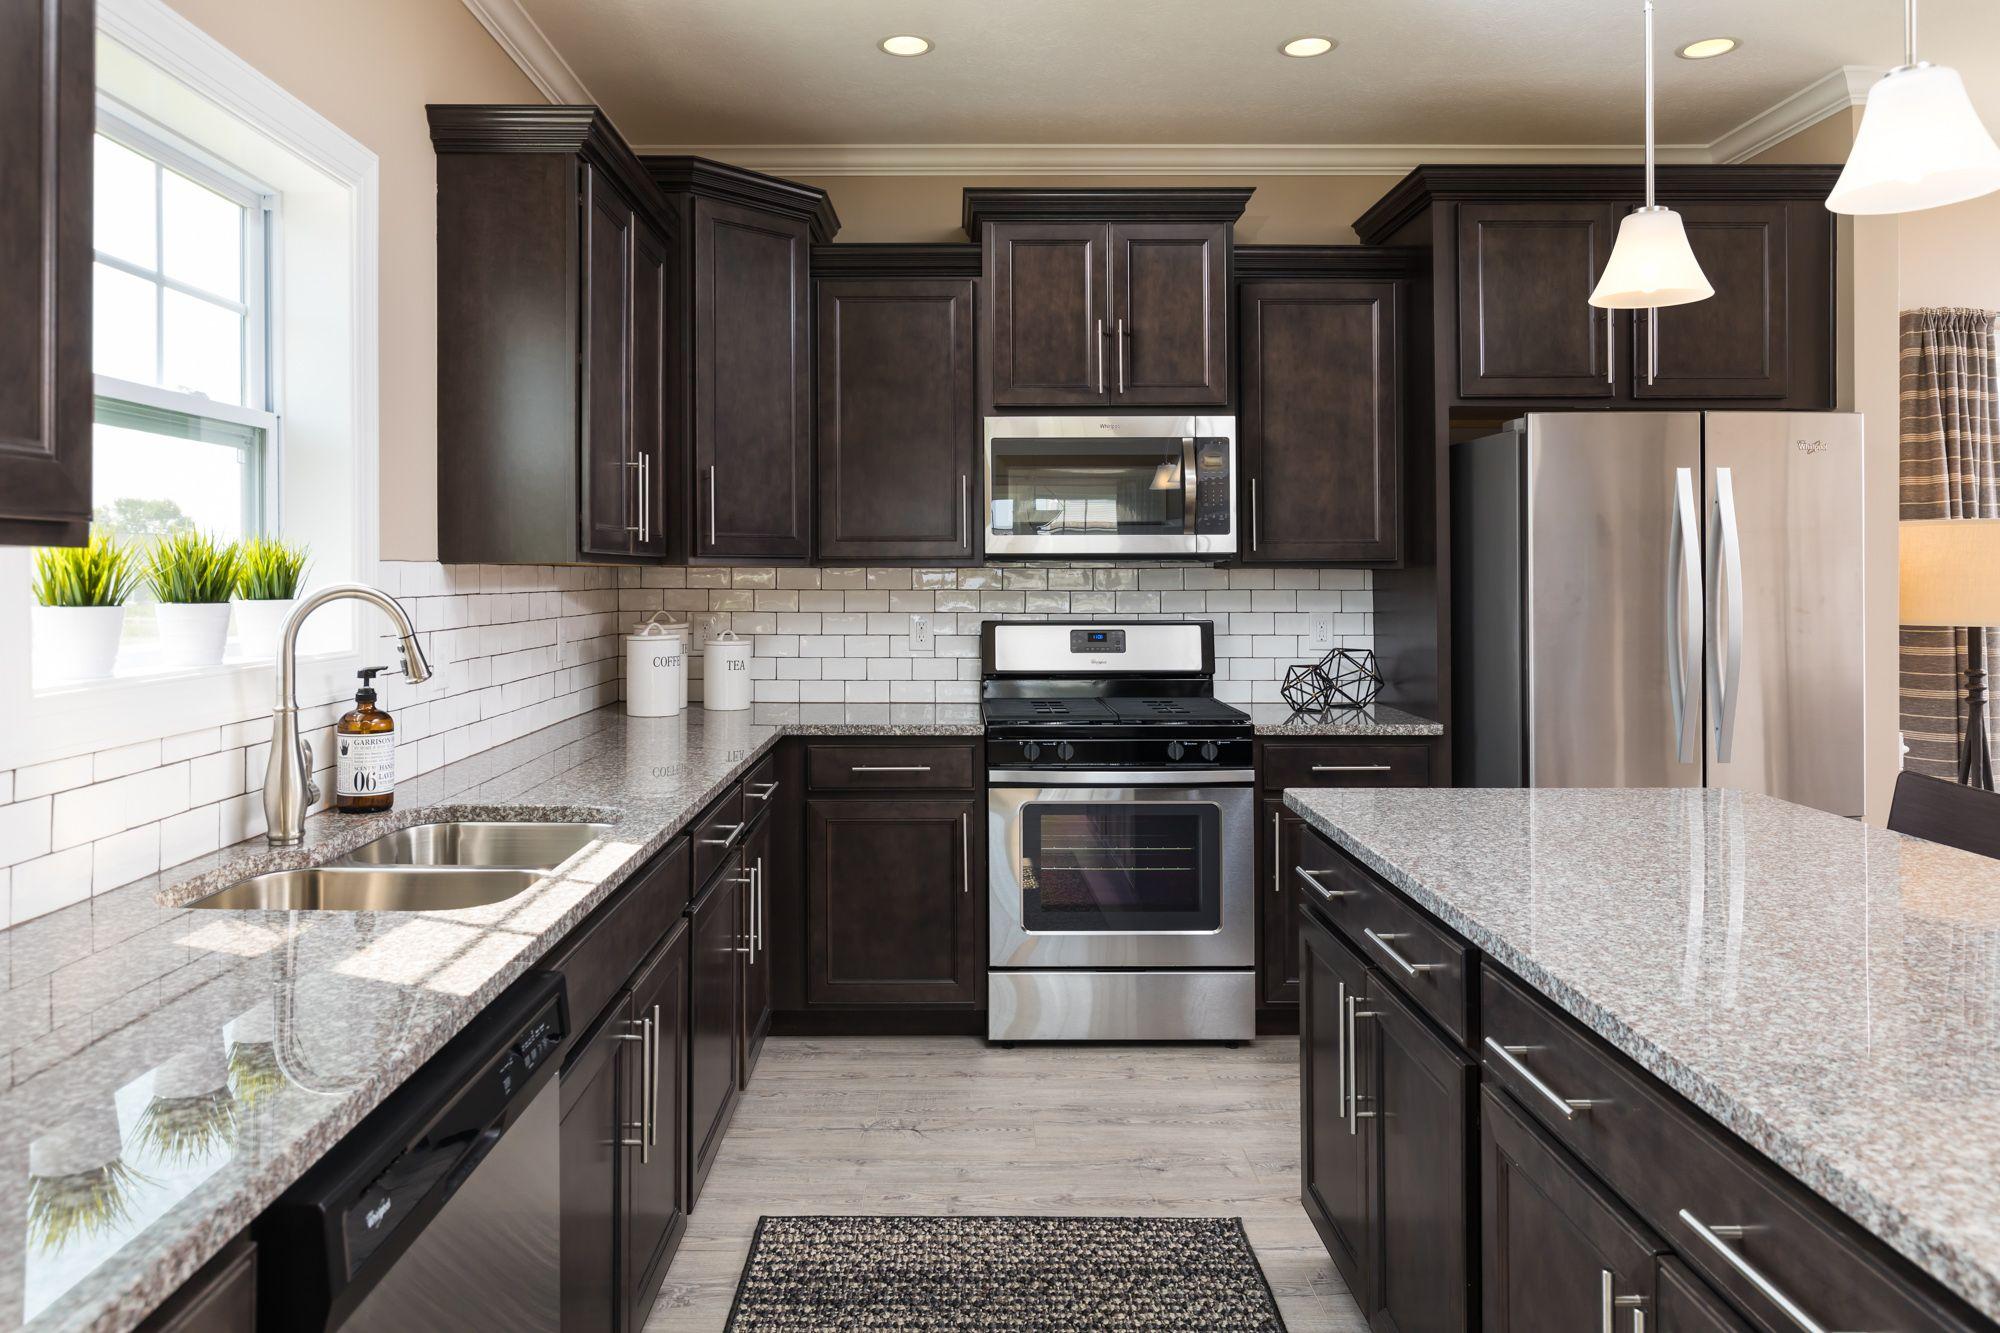 Kitchen featured in the Elements 2600 By Allen Edwin Homes in Detroit, MI